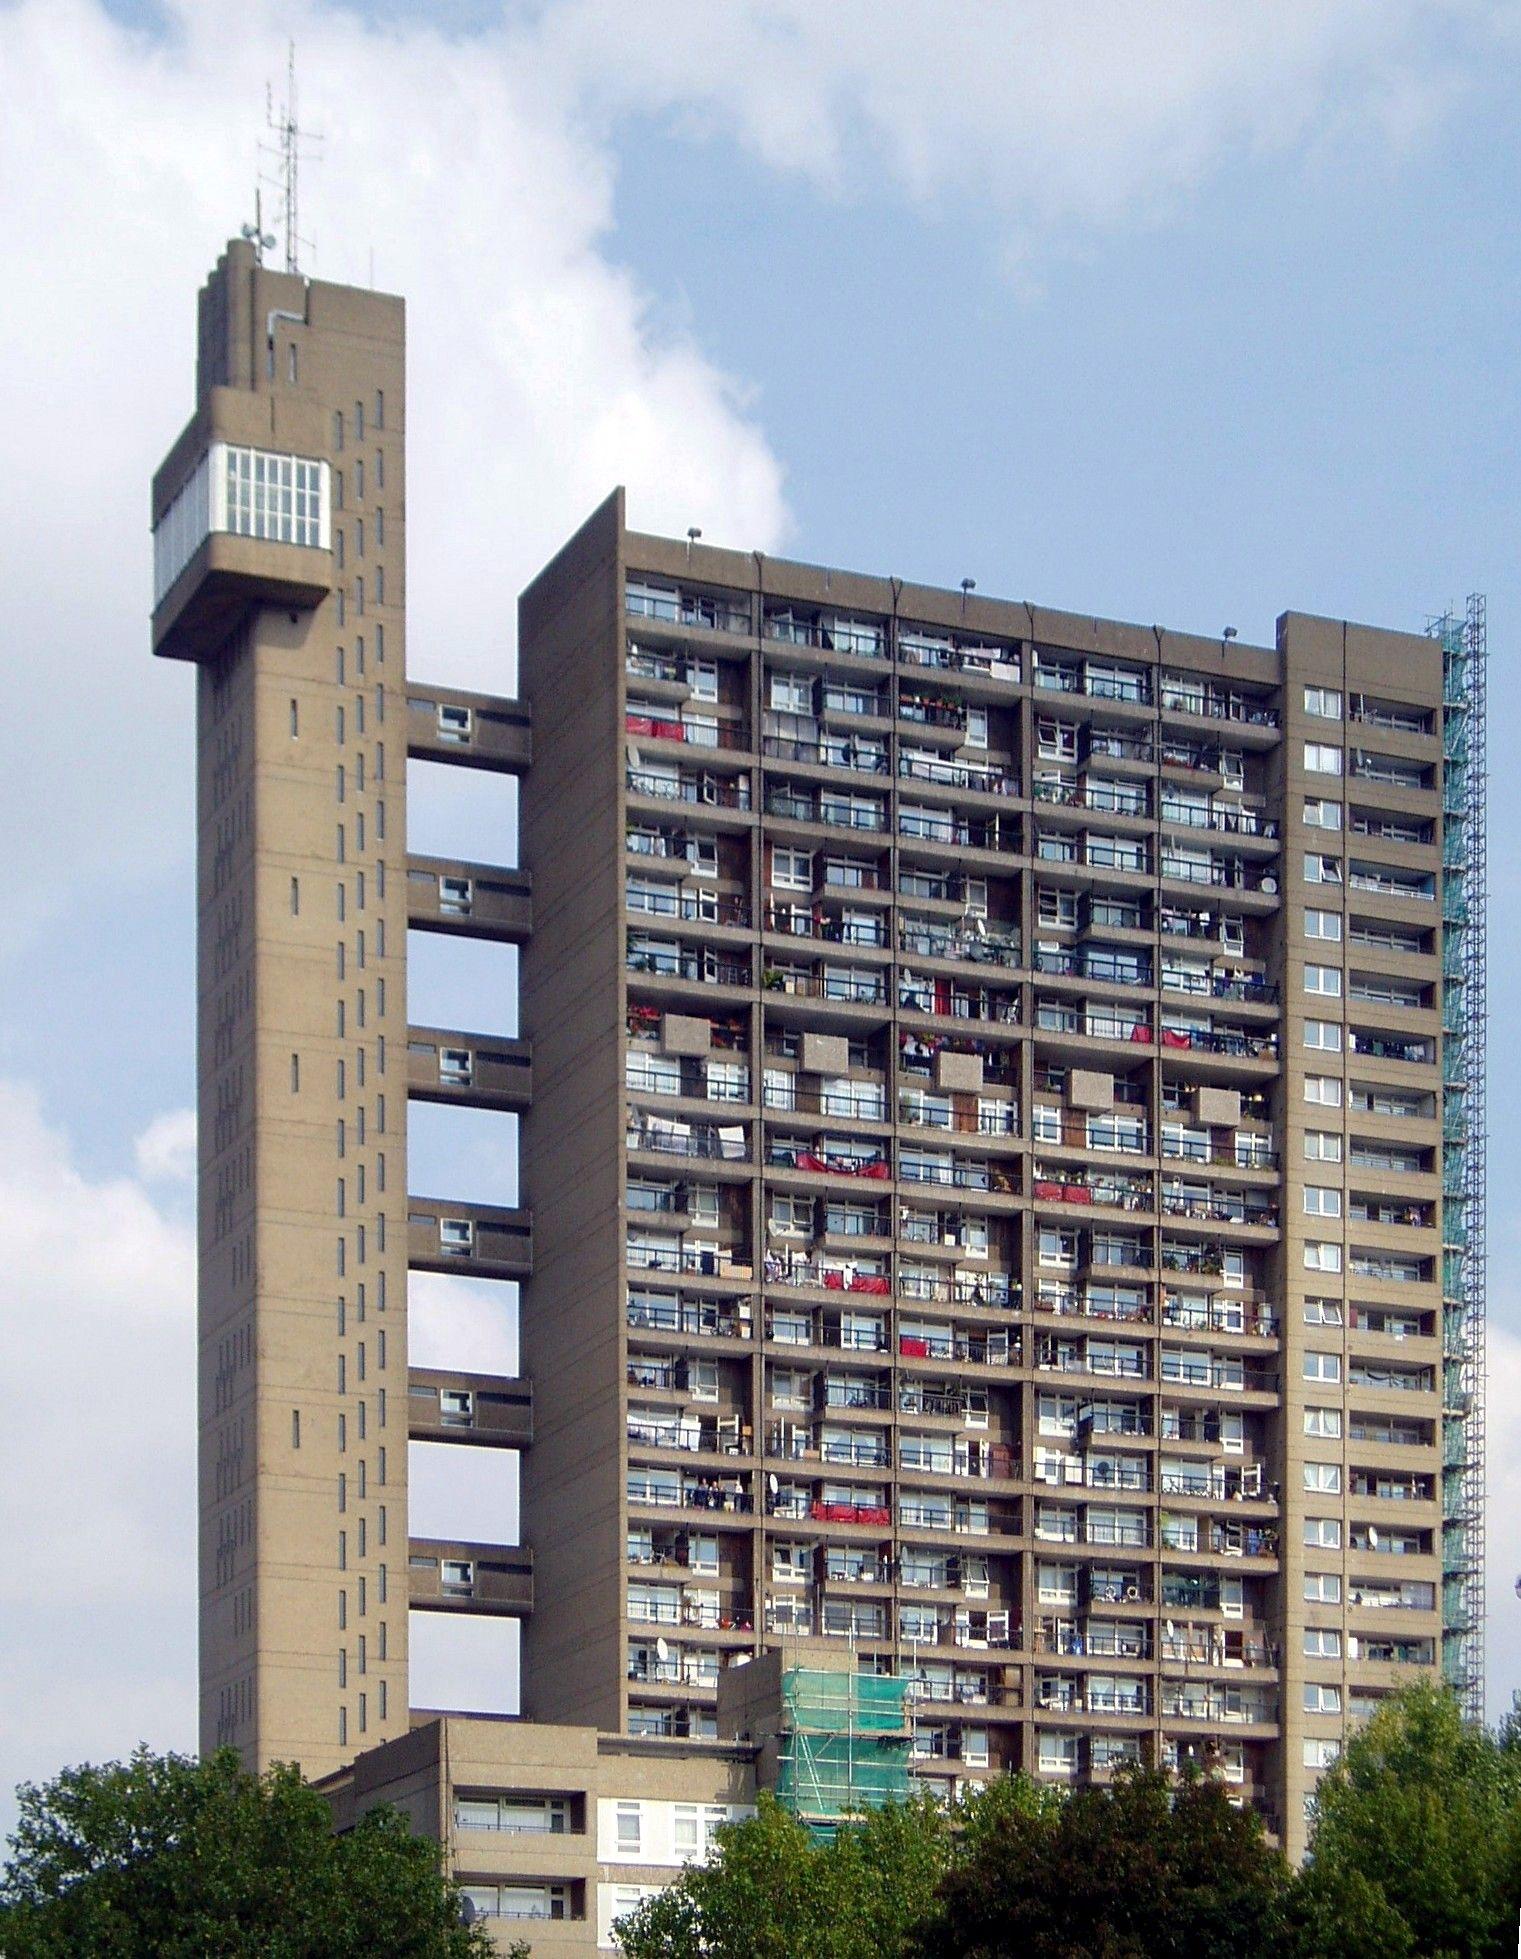 Modern Architecture London England architecture brutalist trellick tower #architecture #brutalism